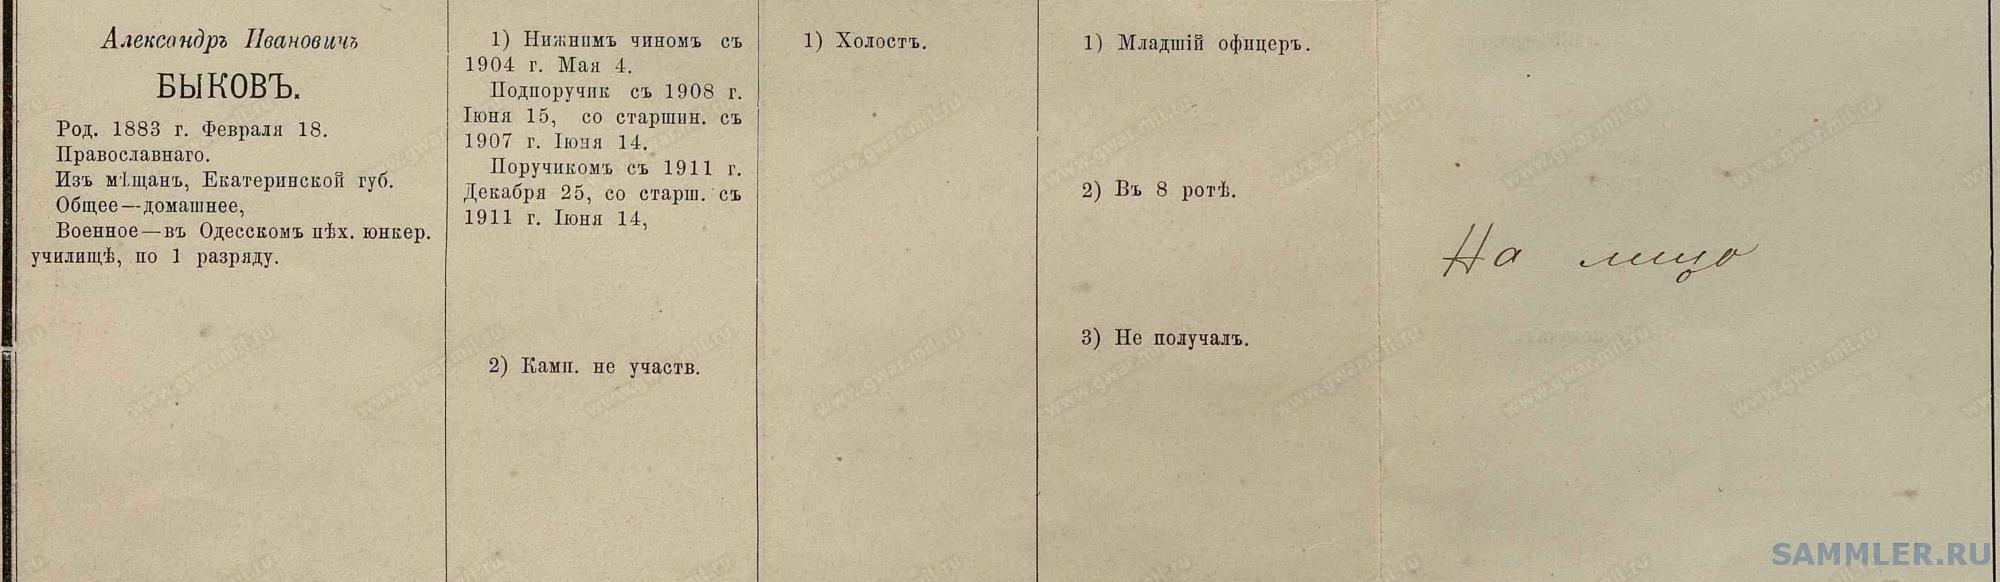 Быков А.И.1.jpg